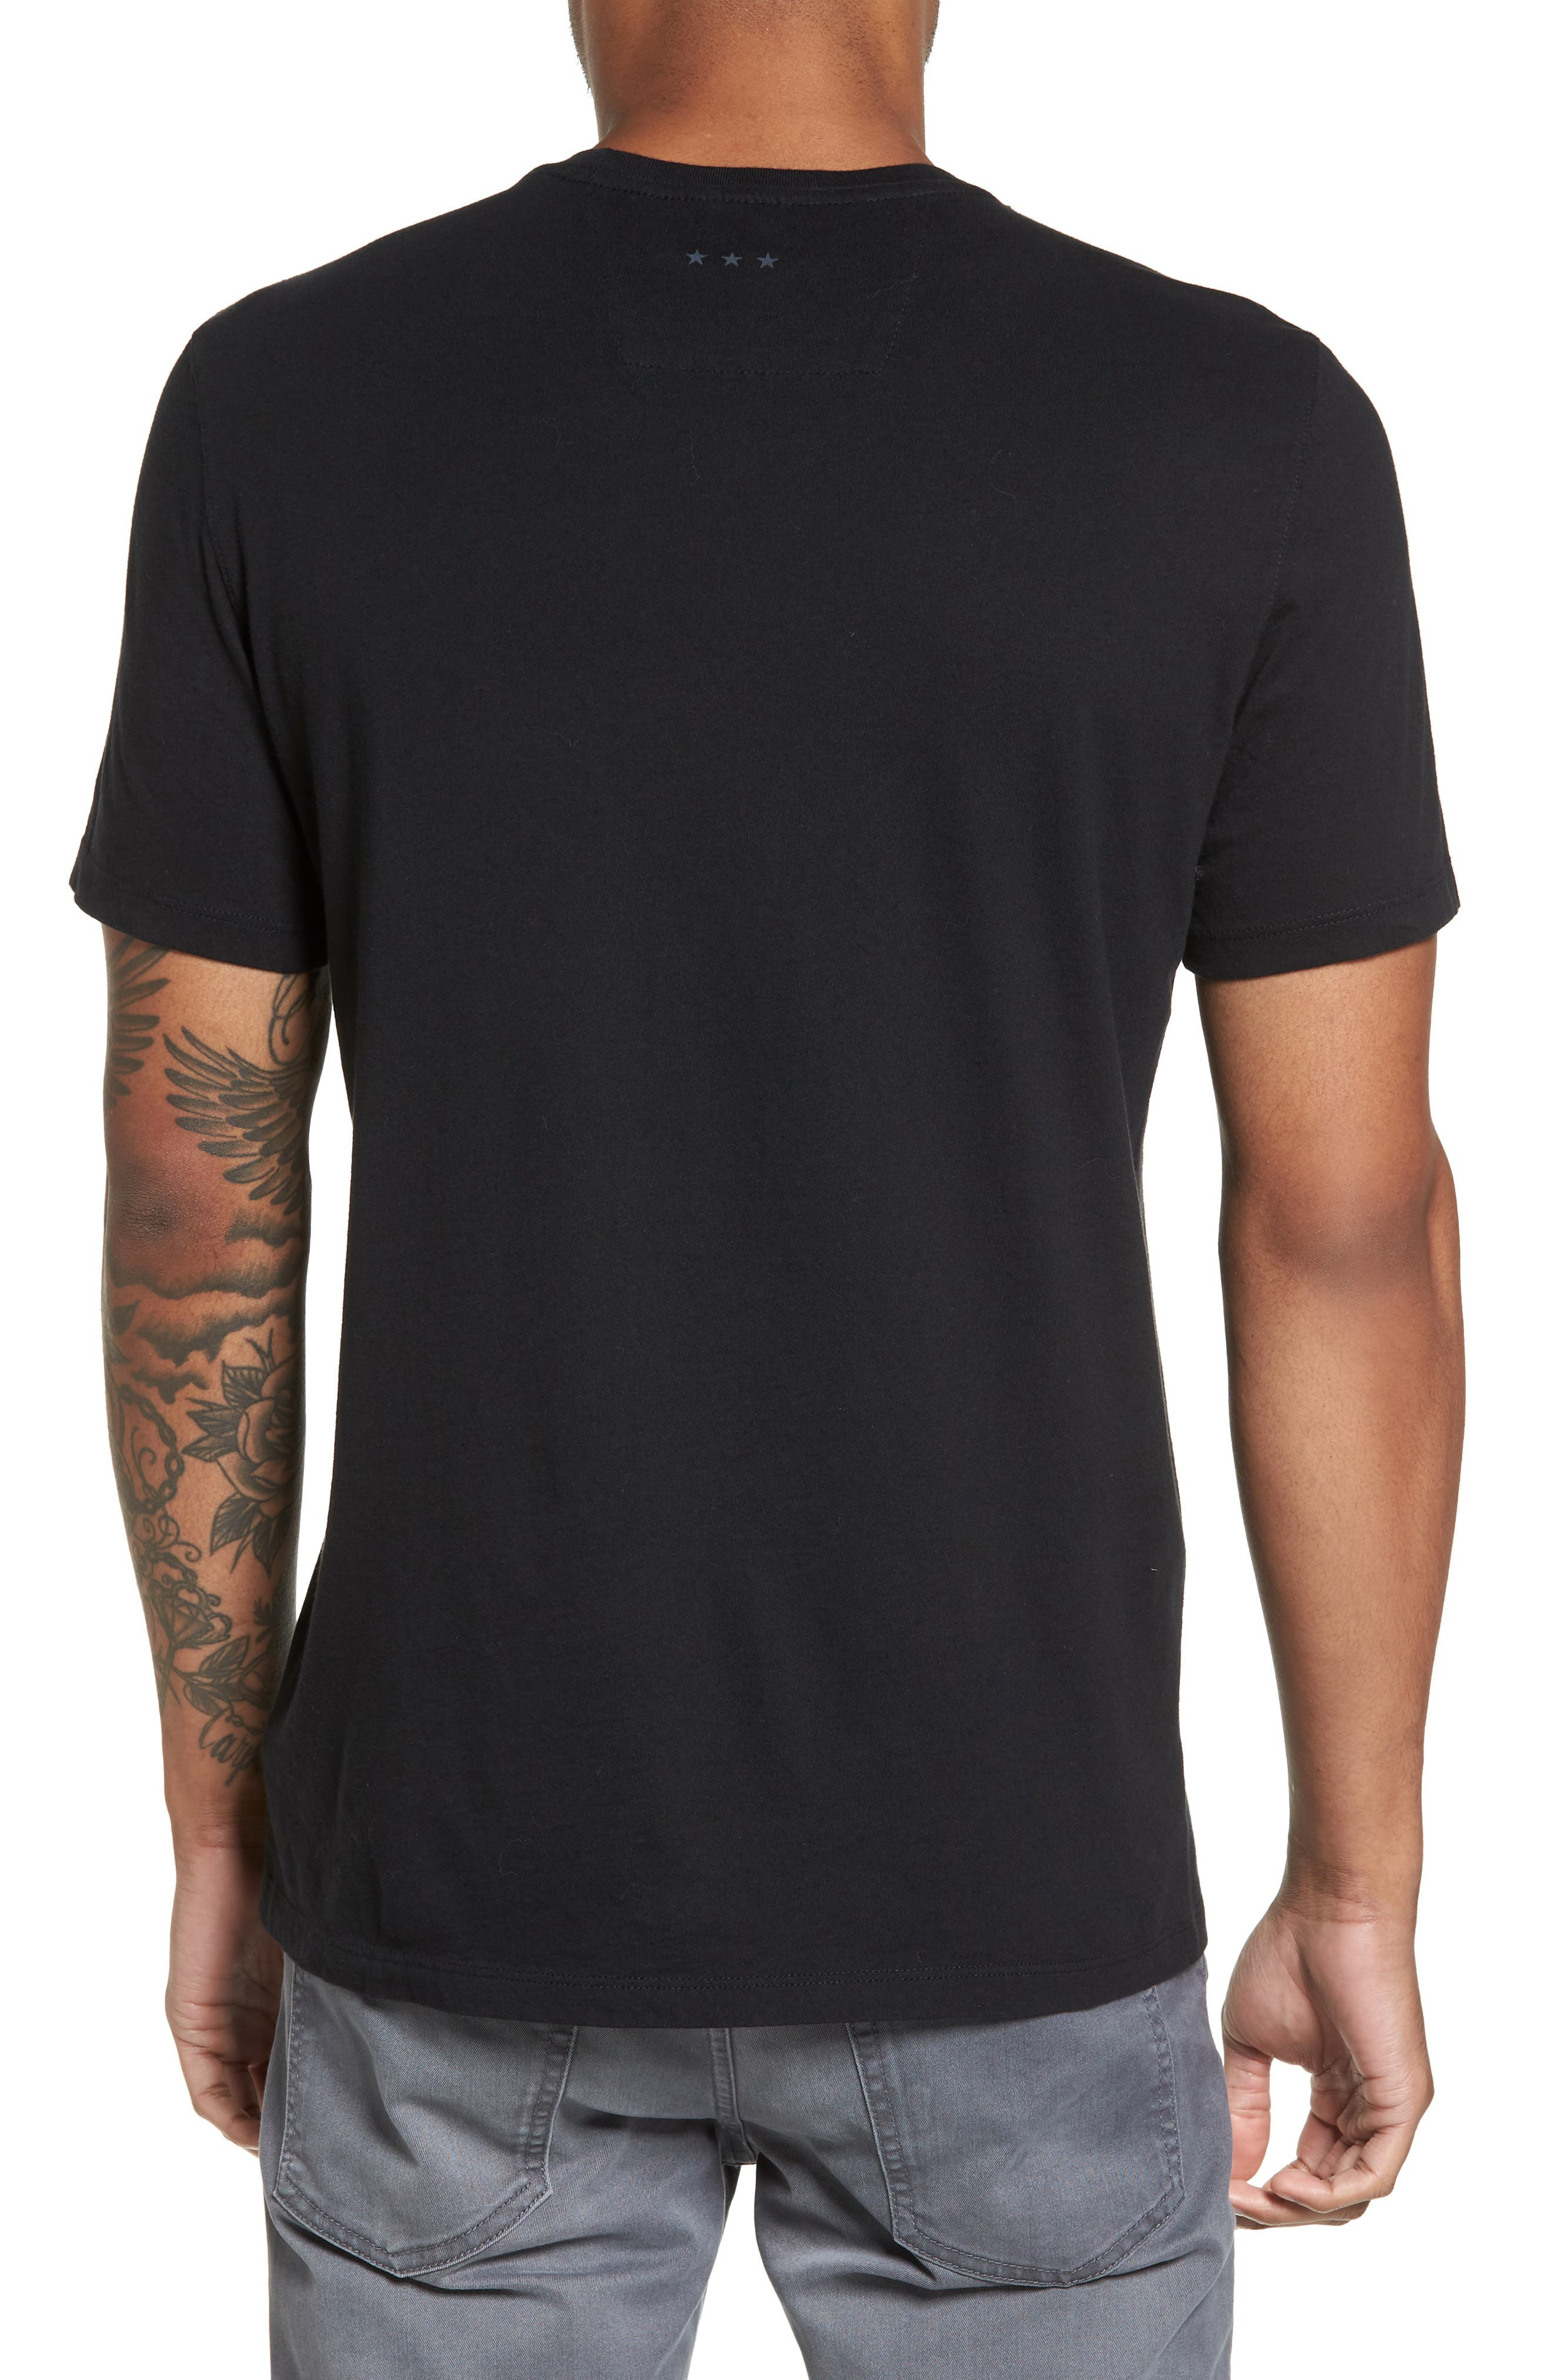 John Varvatos Guns N' Roses Graphic T-Shirt,                             Alternate thumbnail 2, color,                             Black